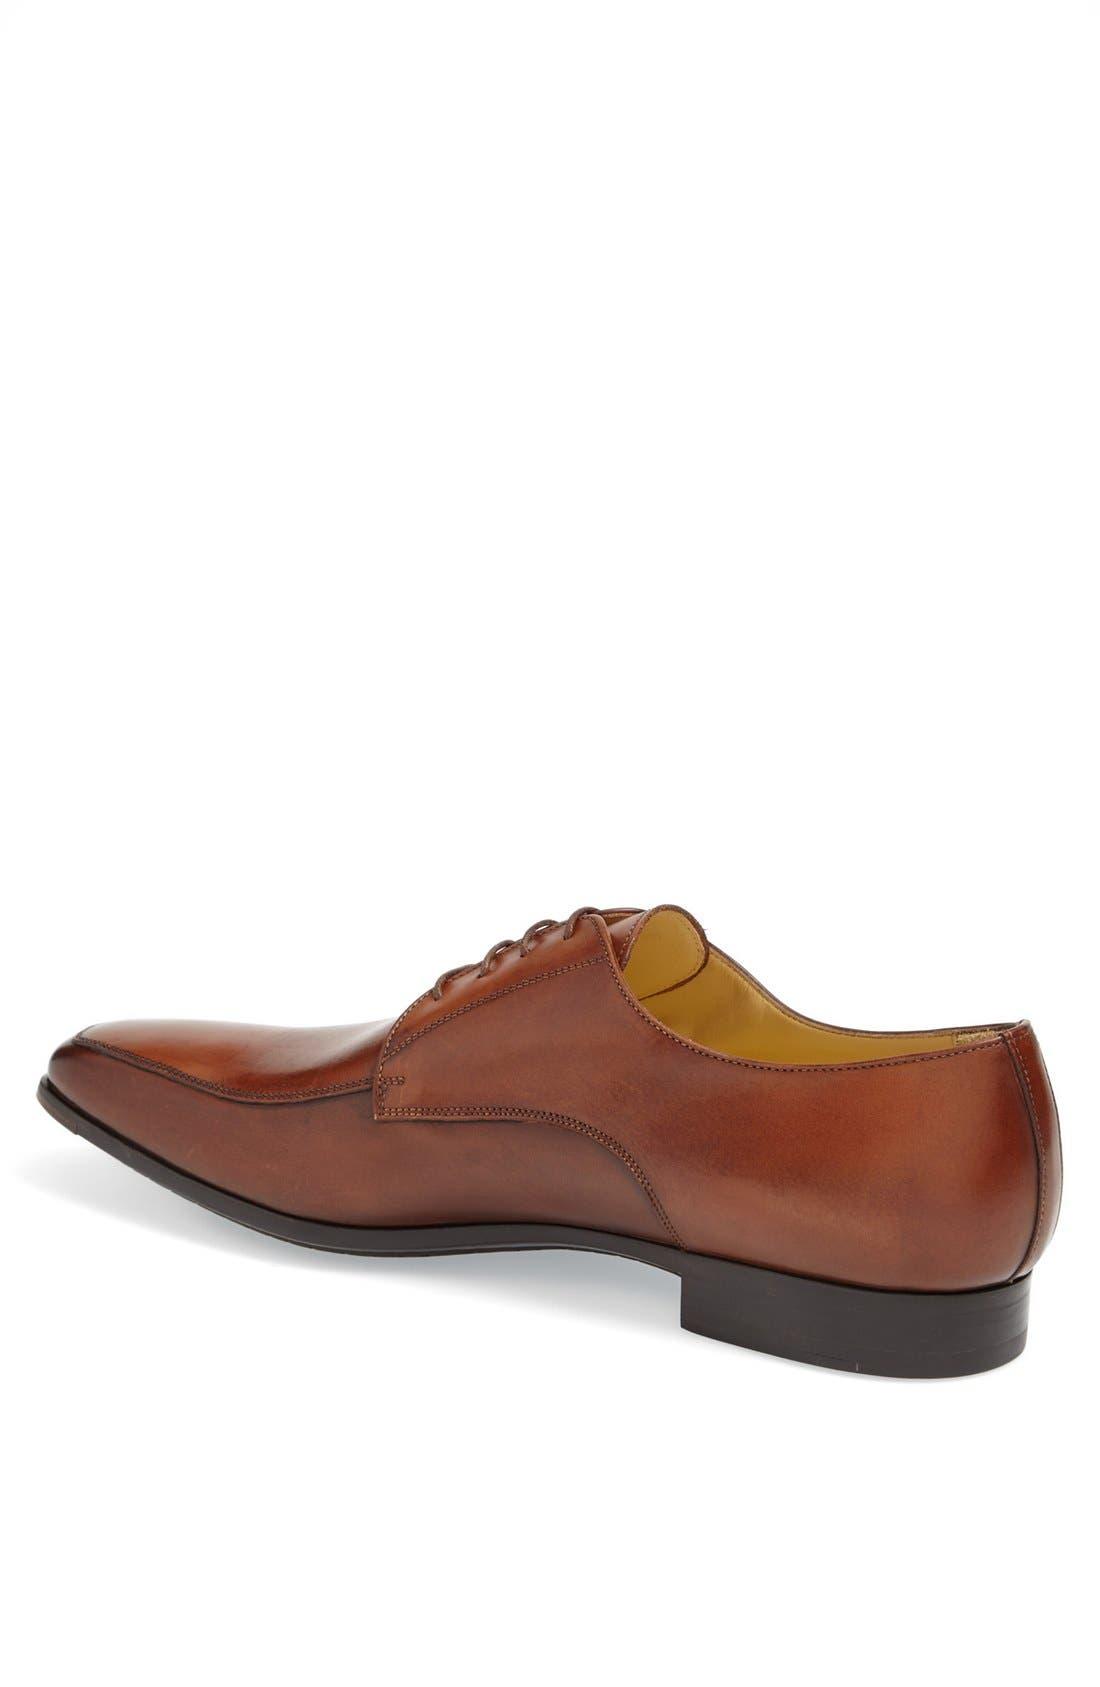 Alternate Image 2  - Santoni 'Prichard' Apron Toe Derby (Men)